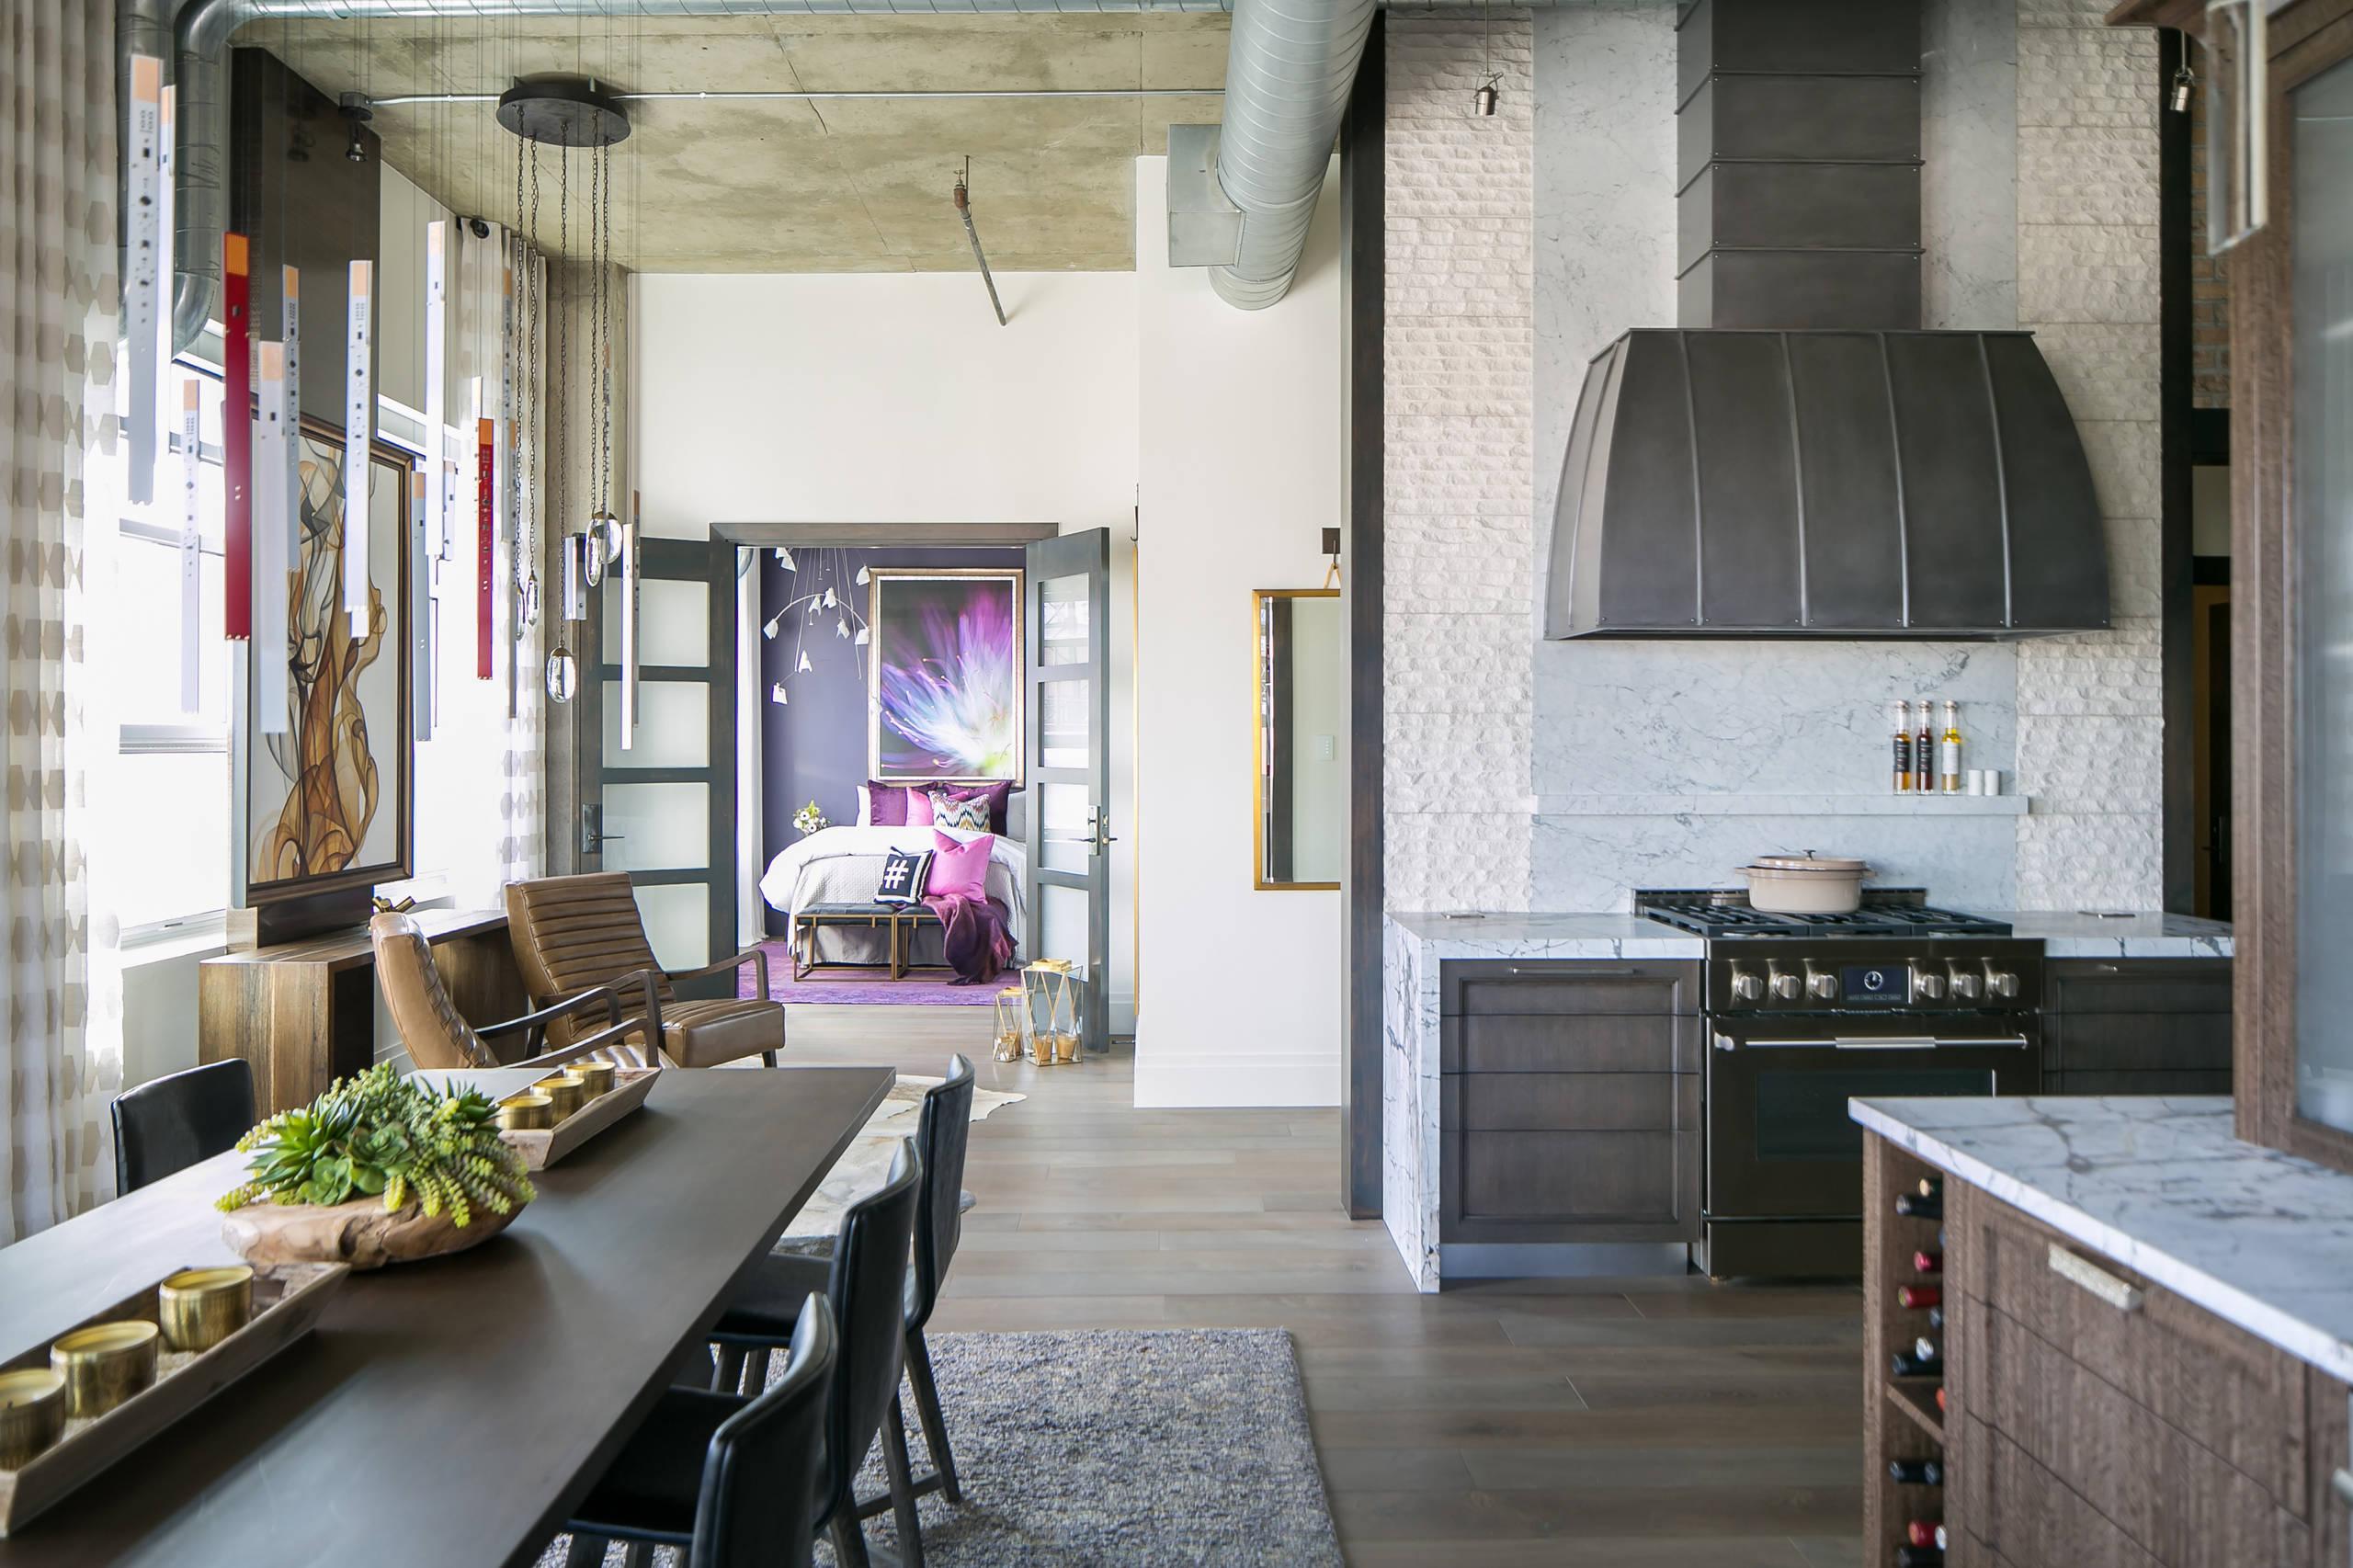 Denver Colorado Residence Loft Style DINING ROOM & KITCHEN